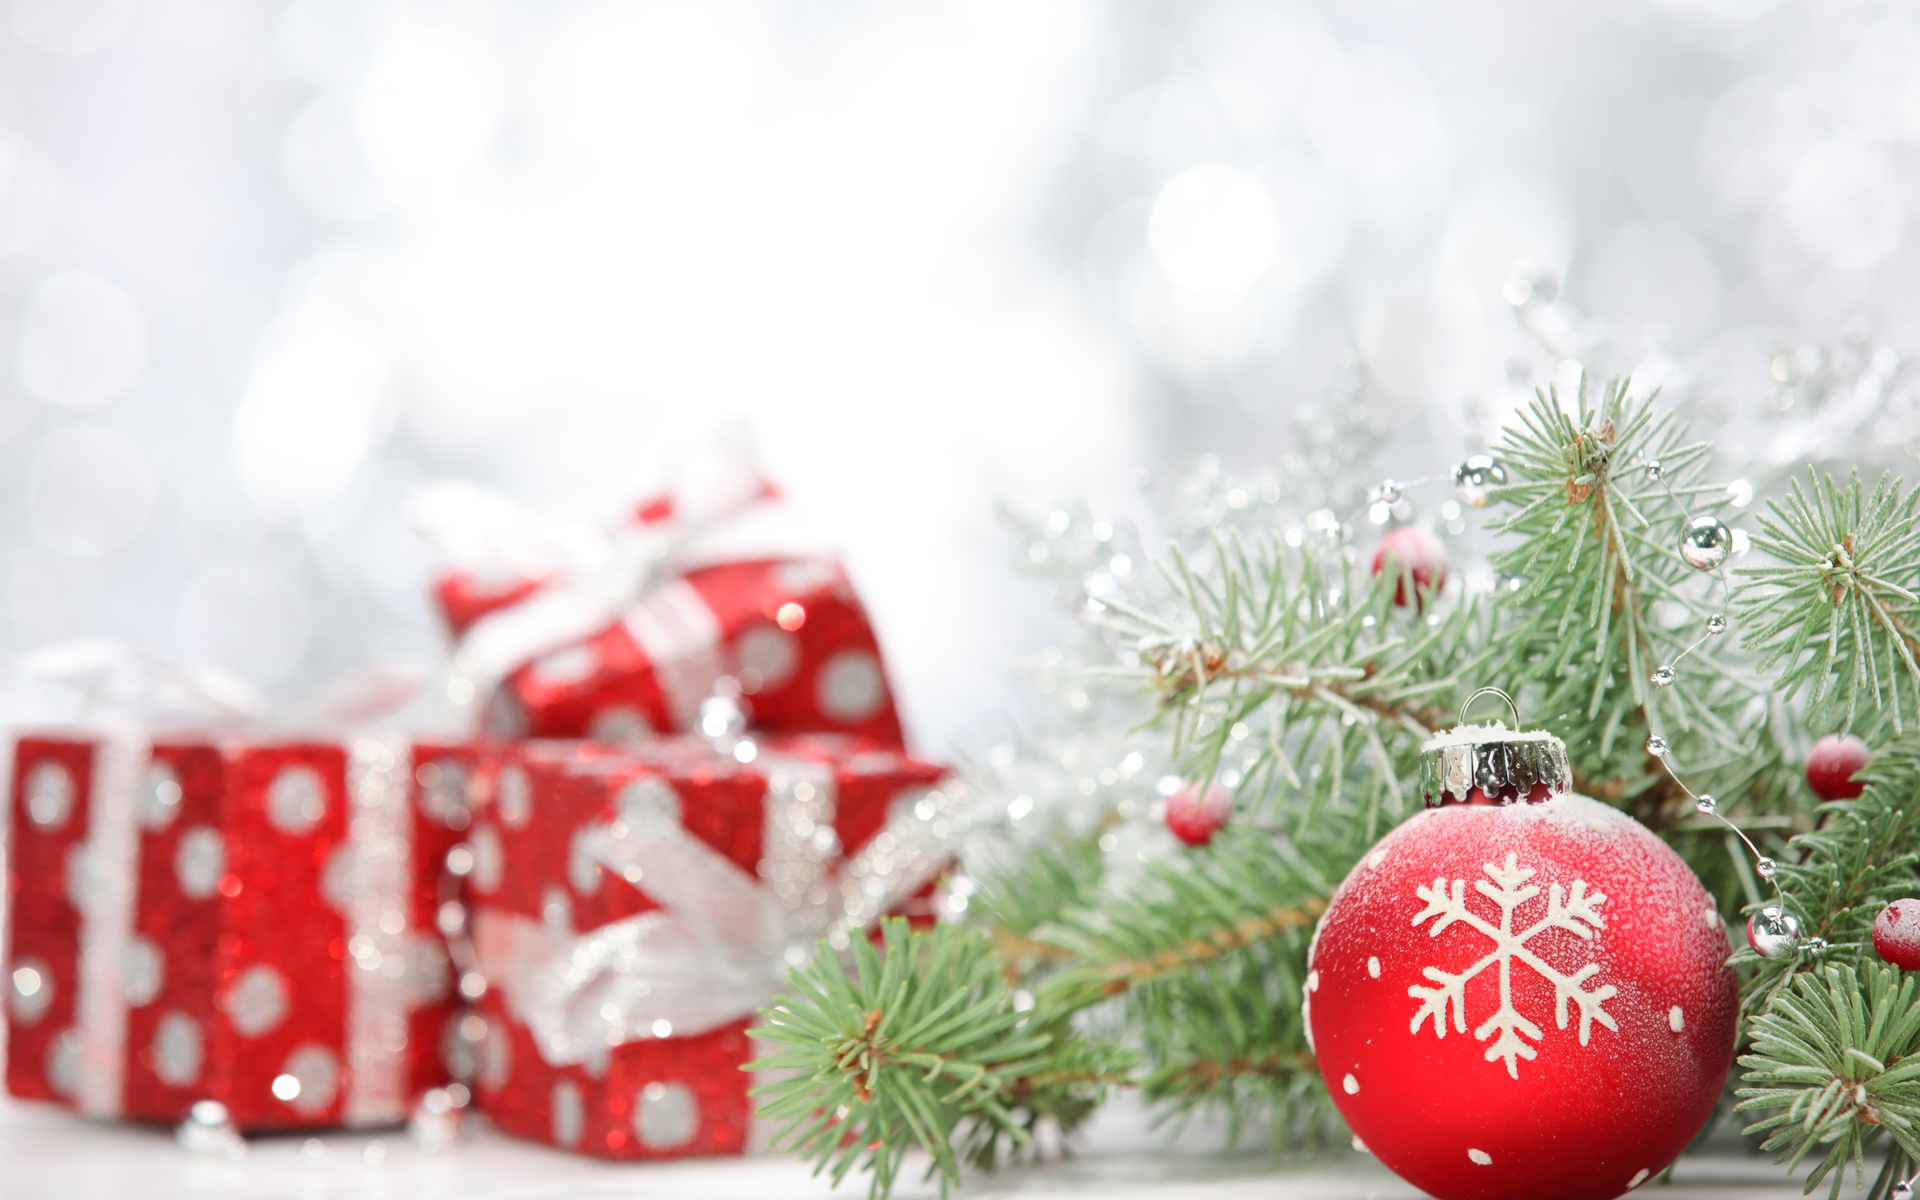 Holiday Wallpapers HD Free Download | PixelsTalk Net